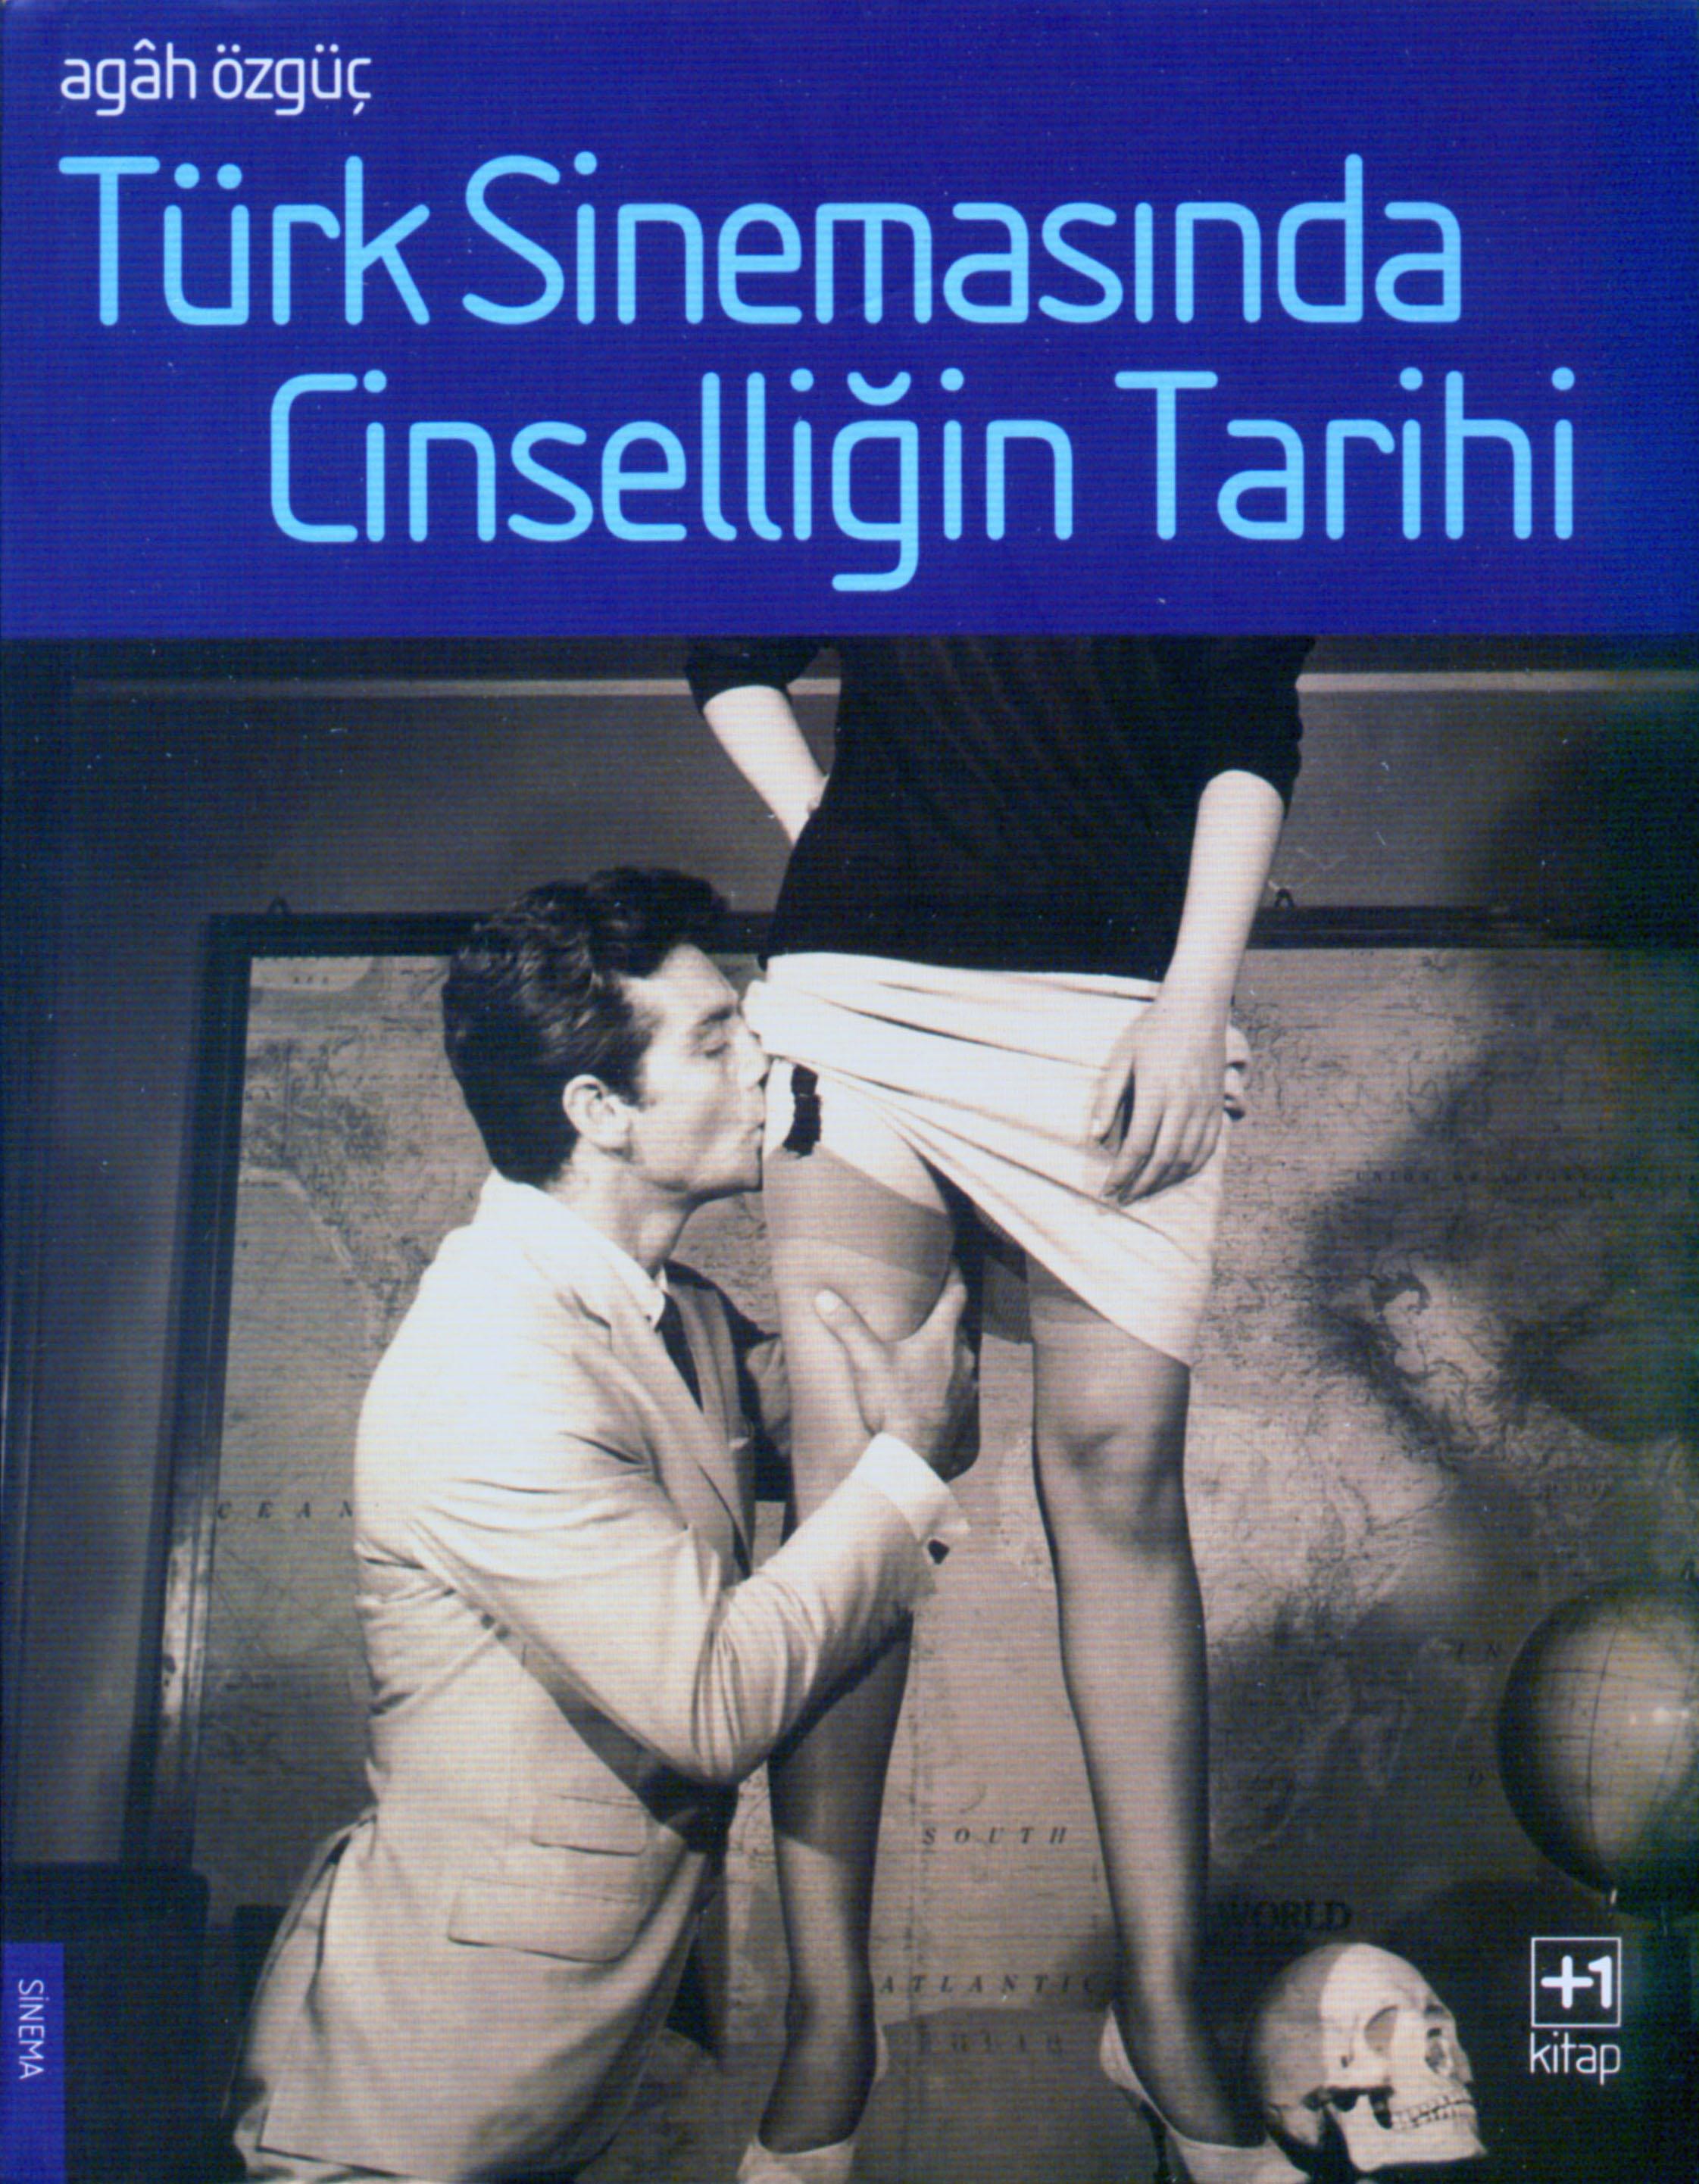 Turk Film